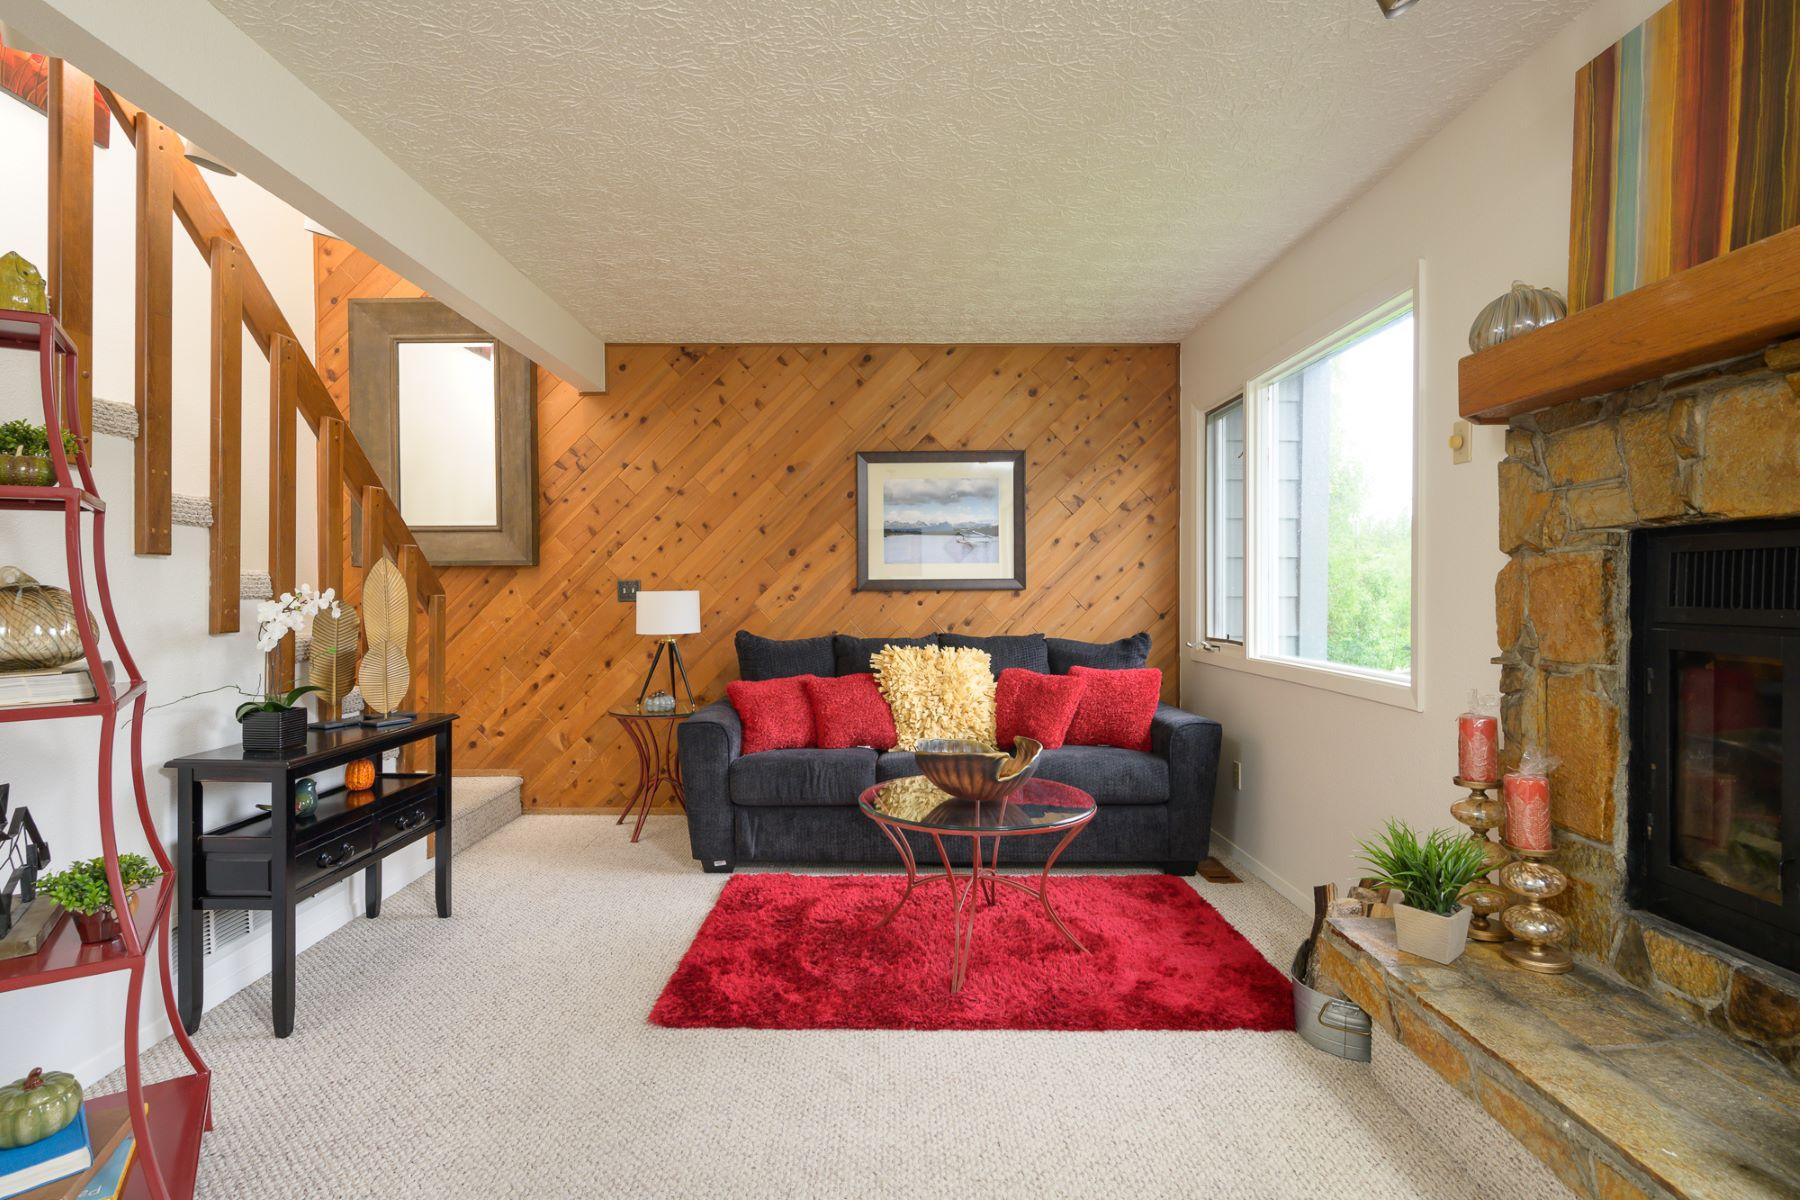 Condominiums vì Bán tại 9661 Victor Road #5B, Anchorage, Alaska 99515 Hoa Kỳ